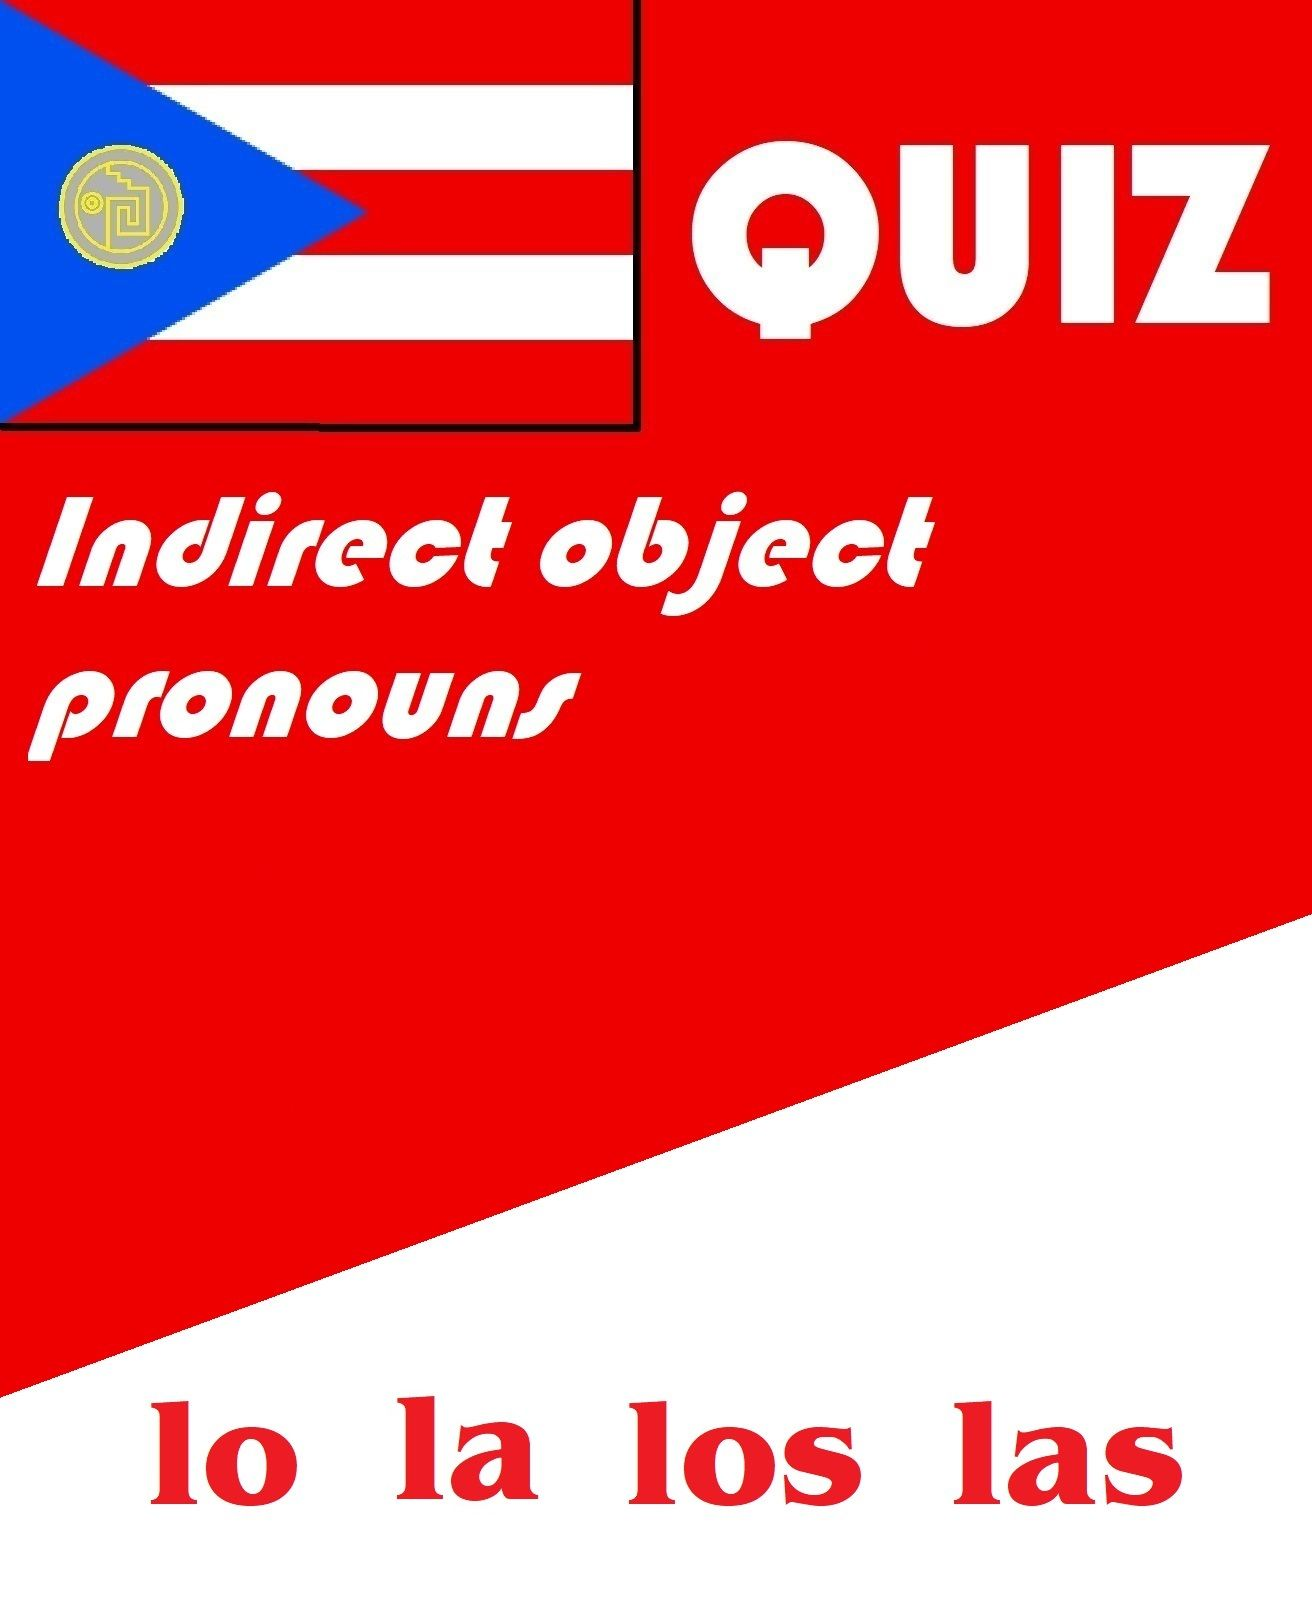 Spanish Indirect Object Pronoun Quiz Or Worksheet Spanish Quizzes Object Pronouns Worksheets [ 1610 x 1312 Pixel ]